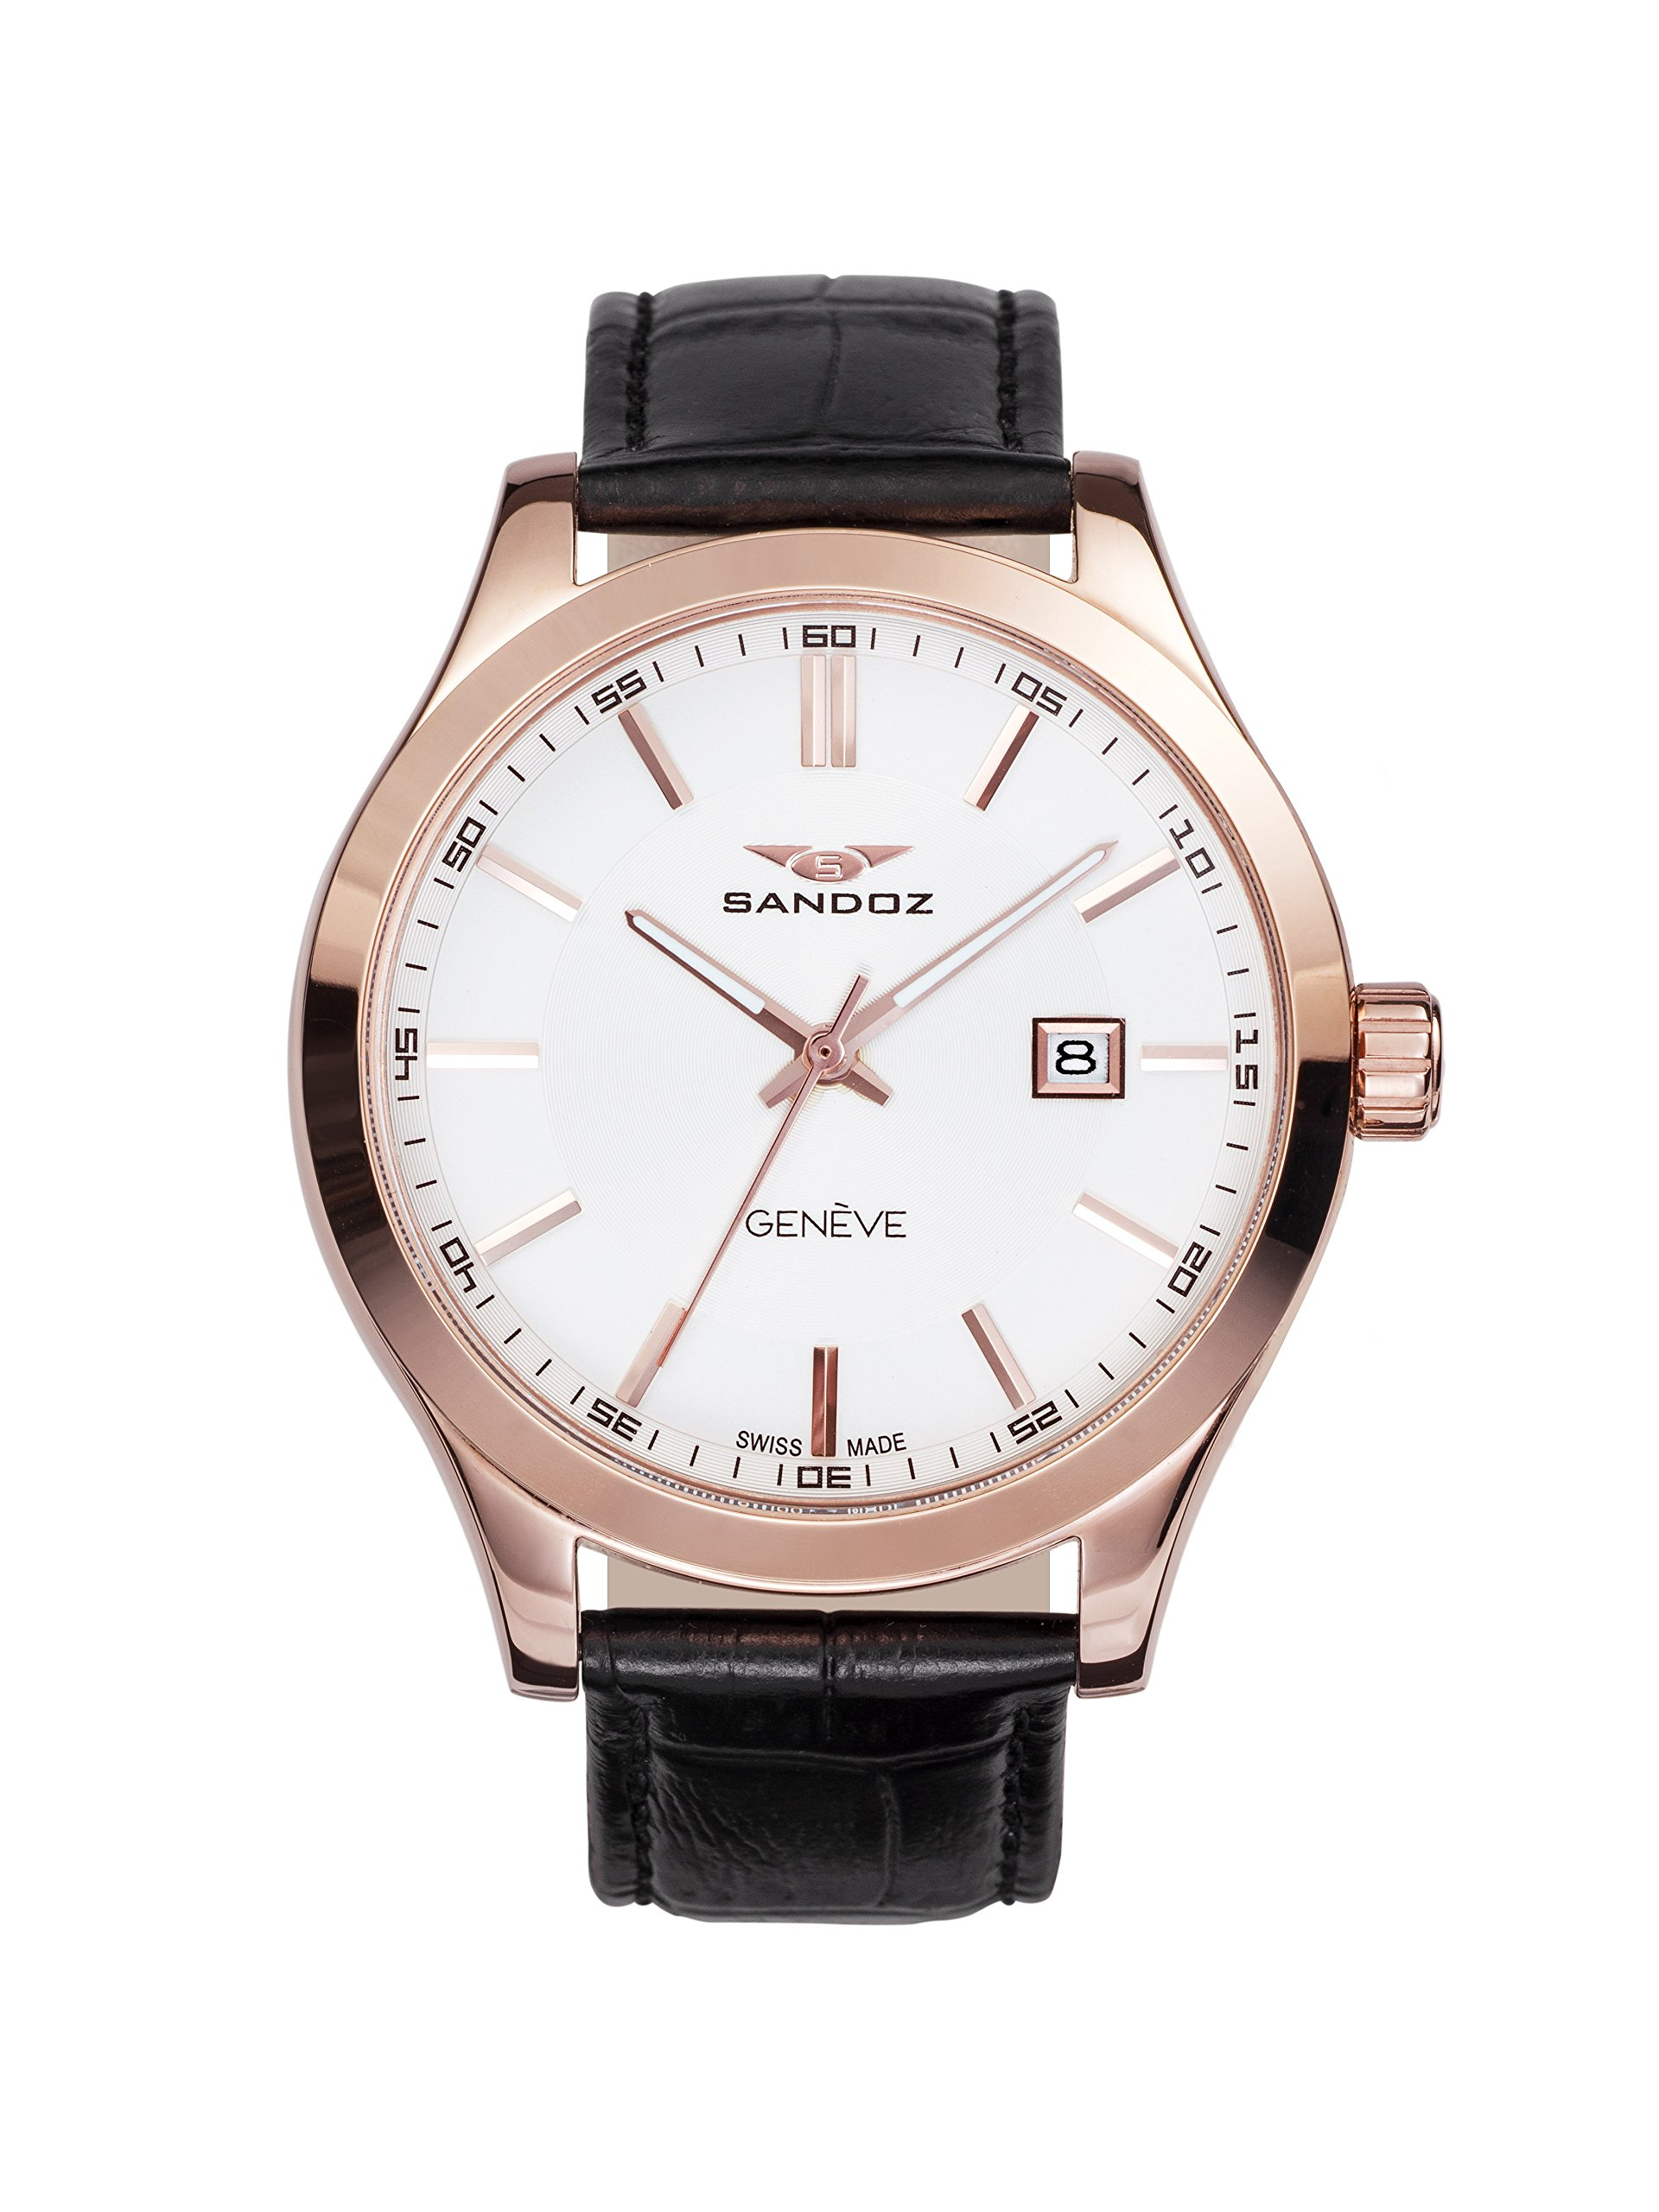 Reloj Suizo Sandoz Caballero 81377-87 Sport Collection